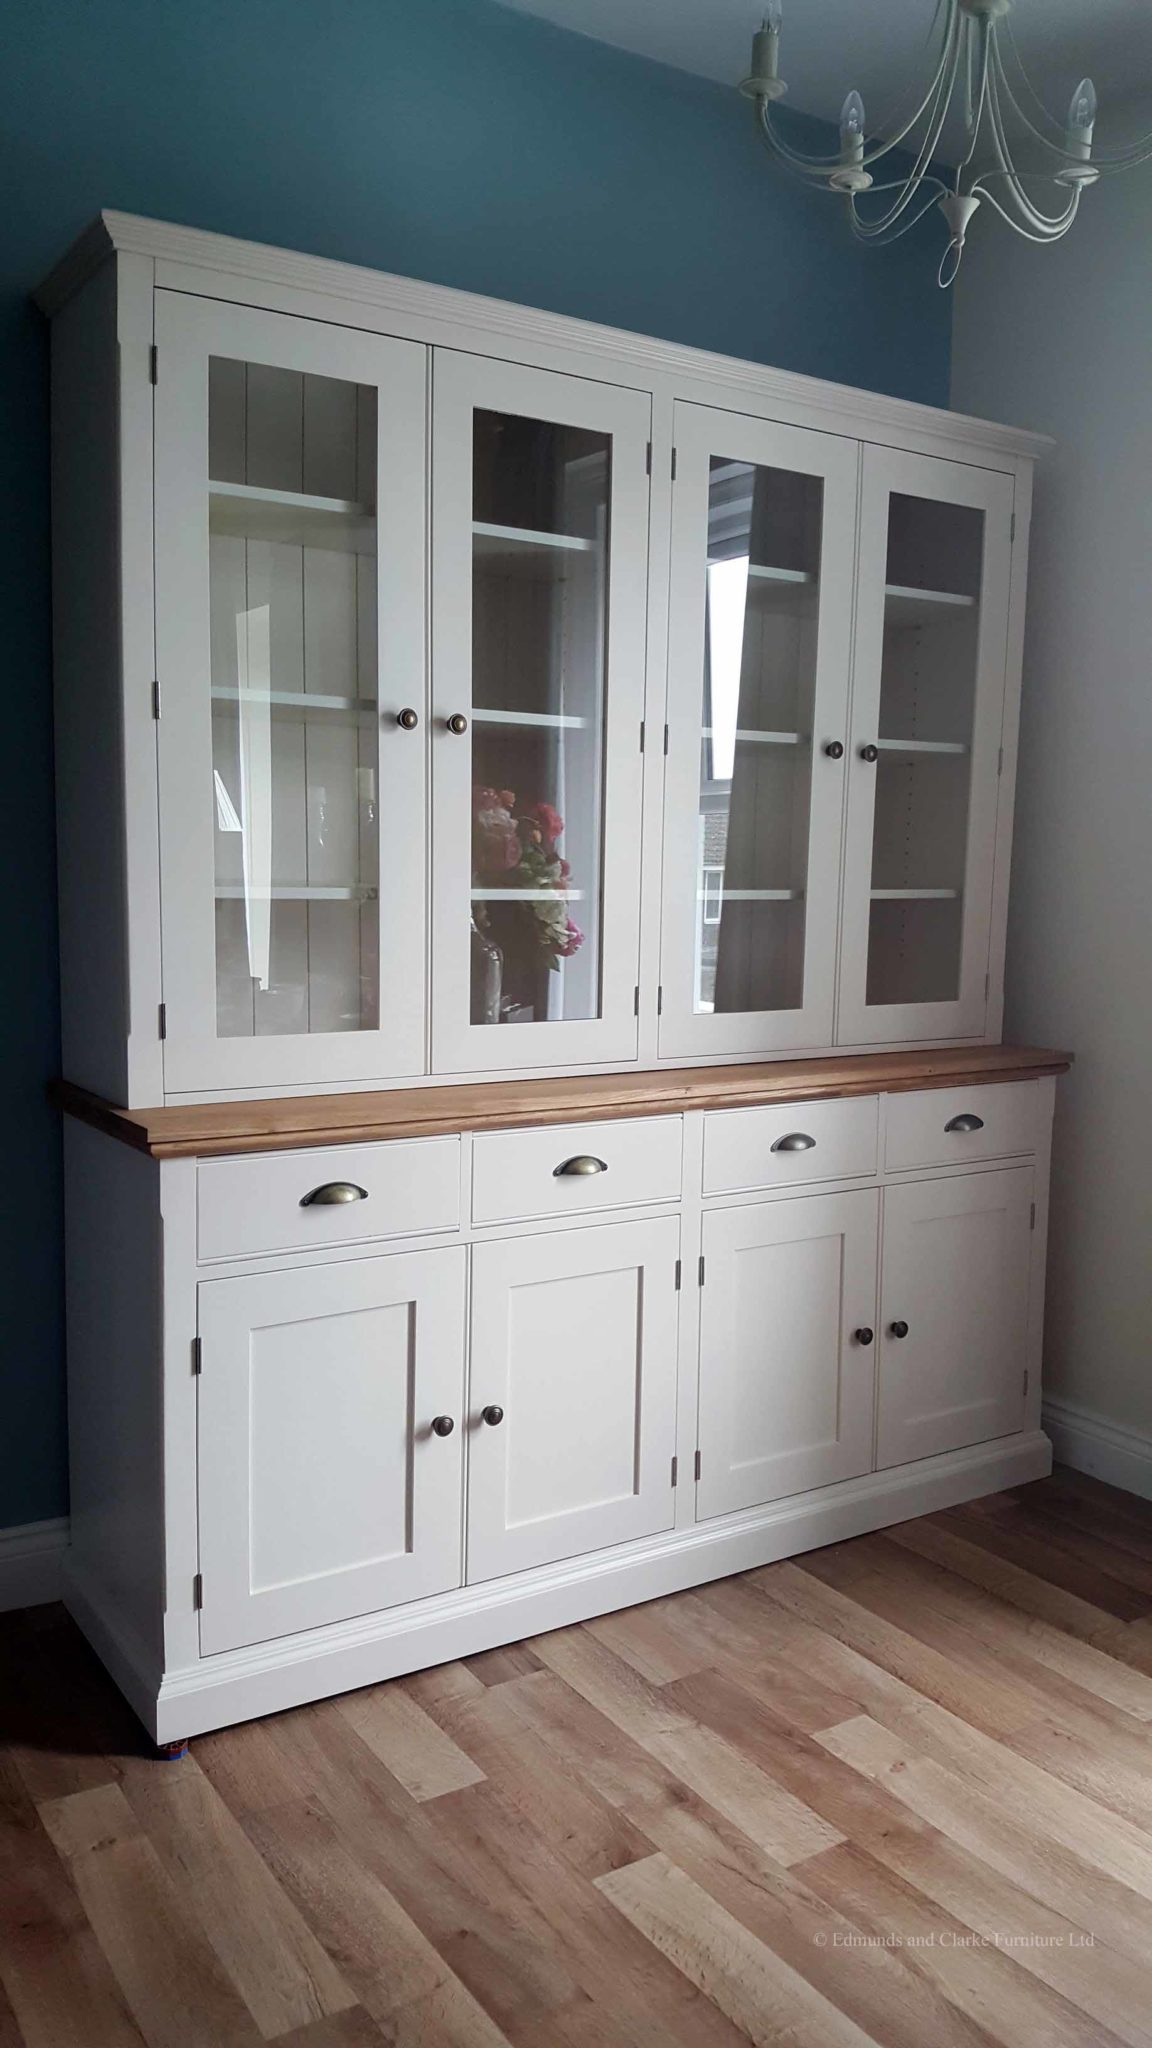 Edmunds painted 6ft Fully Glazed Dresser. Sideboard has moulded oak top, 4 drawers and 4 doors under. adjustable shelves. choice of handles. EDM06